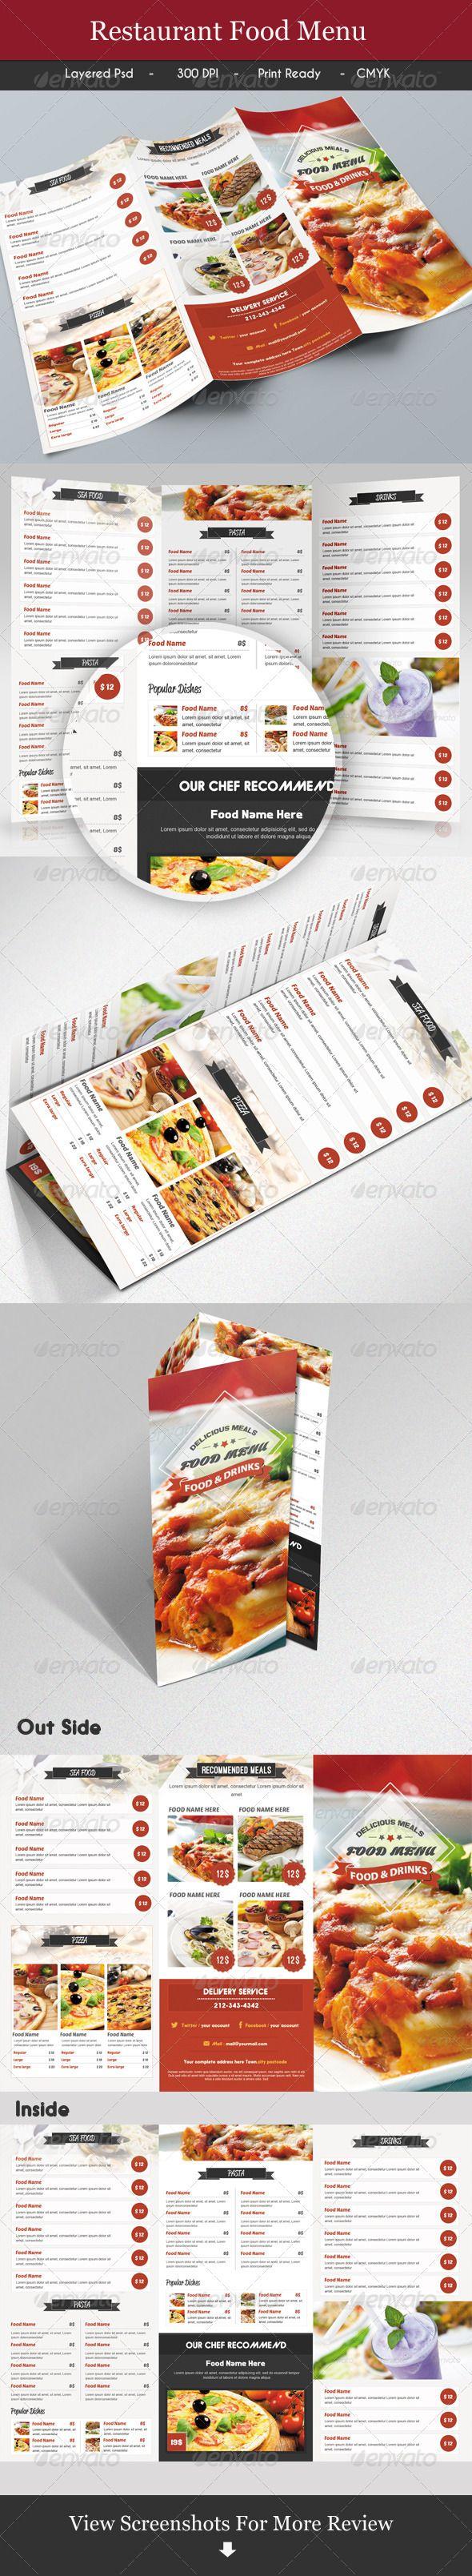 455 best trifold restaurant menu template images on pinterest trifold restaurant menu 2 pronofoot35fo Choice Image